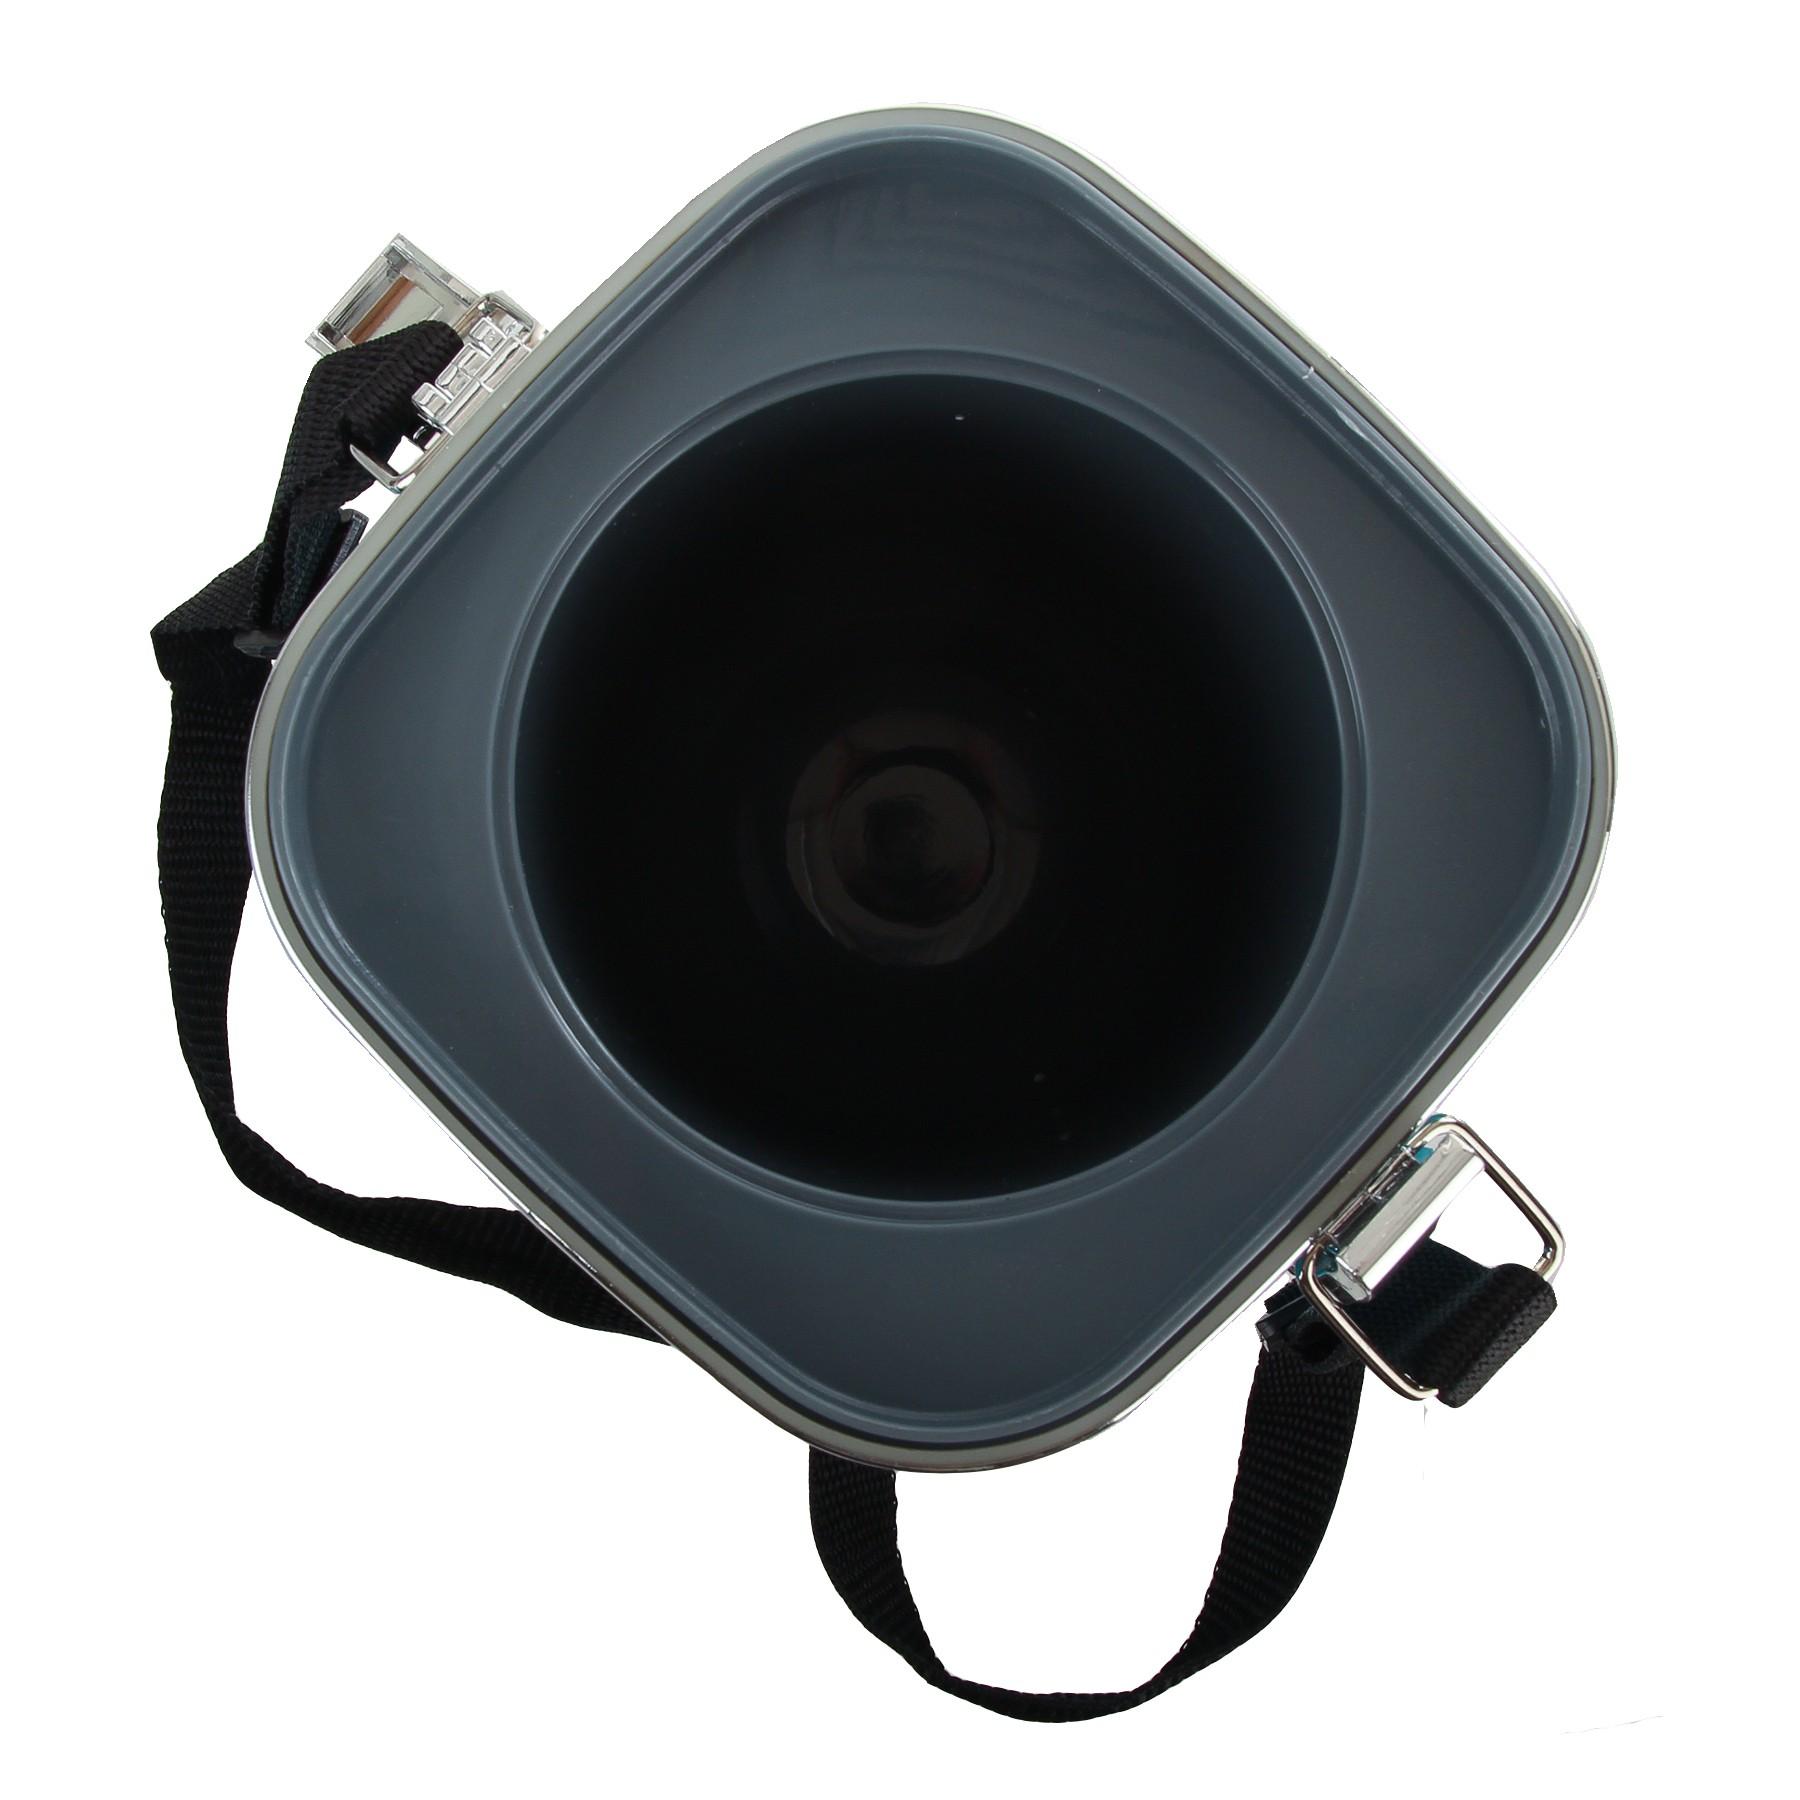 Wärme Zylinder, 1,8 L Bild https://cdn03.plentymarkets.com/zsy4vjx32p87/item/images/5041/full/13066A-ama-05.JPG